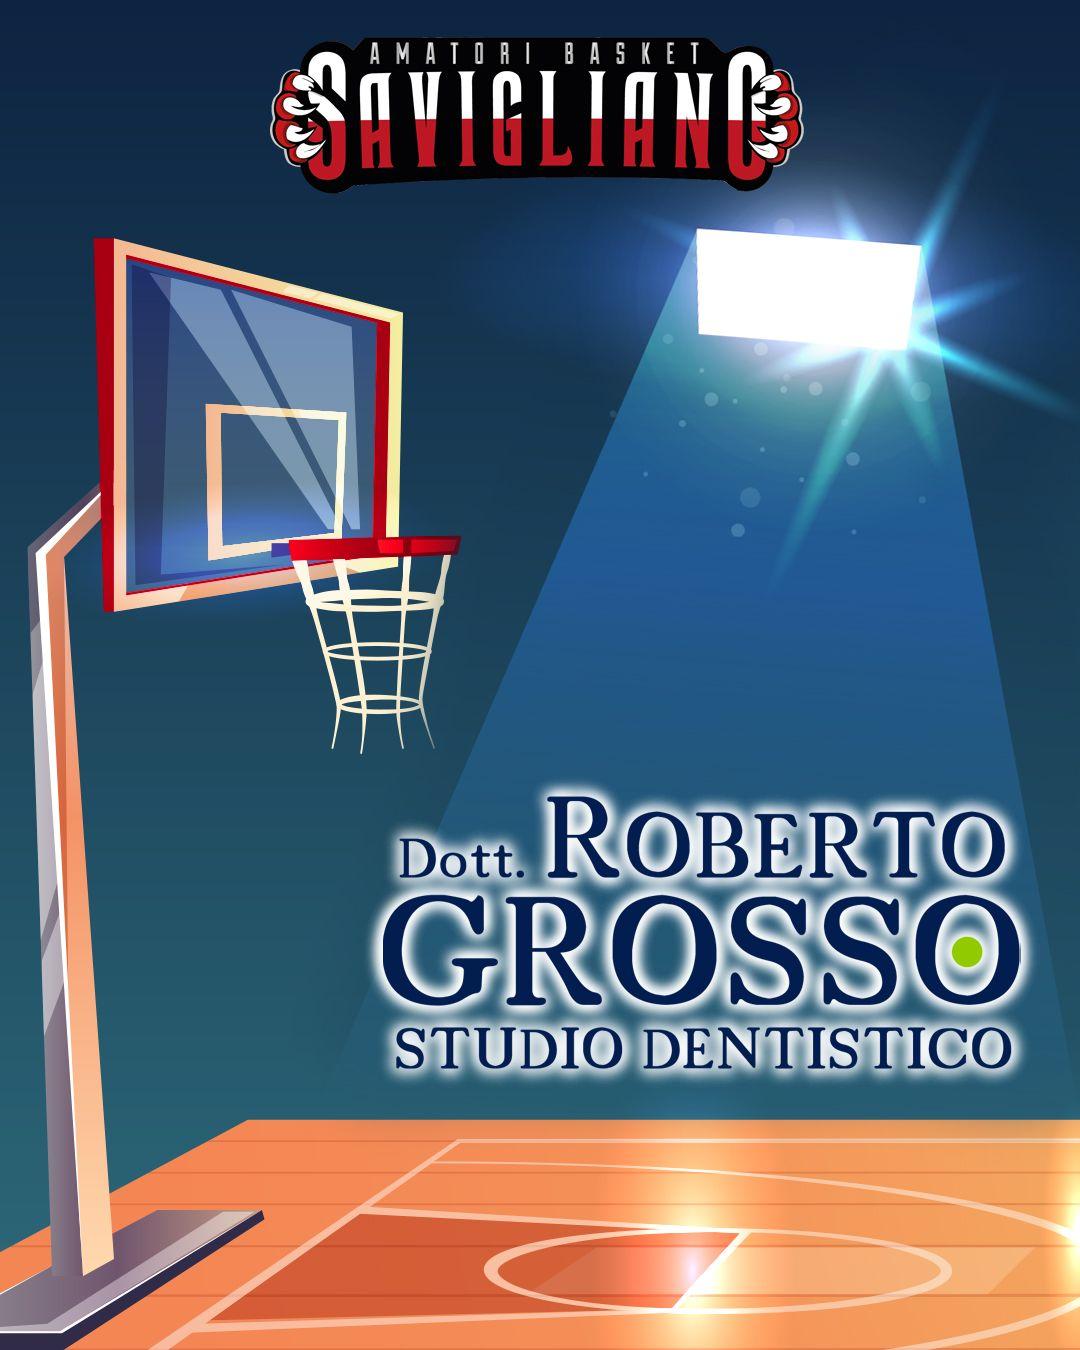 ABS on the spotlight: Studio Dentistico Grosso!